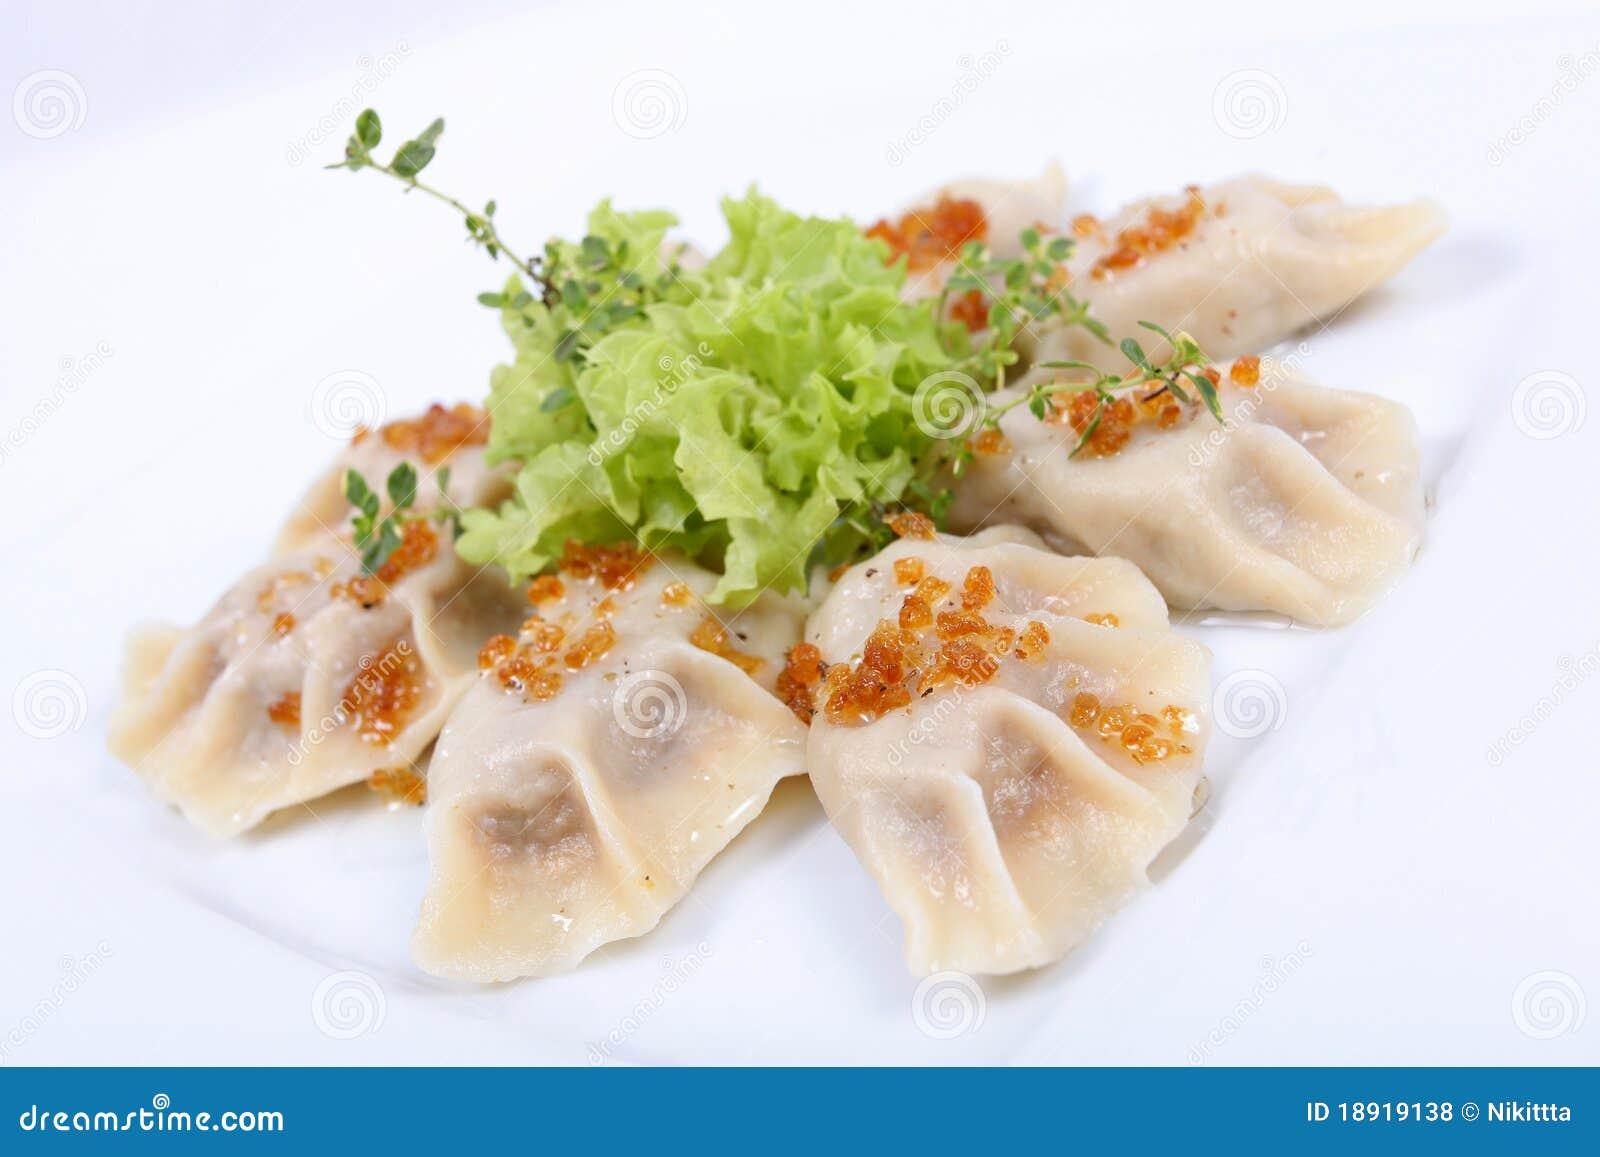 how to serve polish dumplings